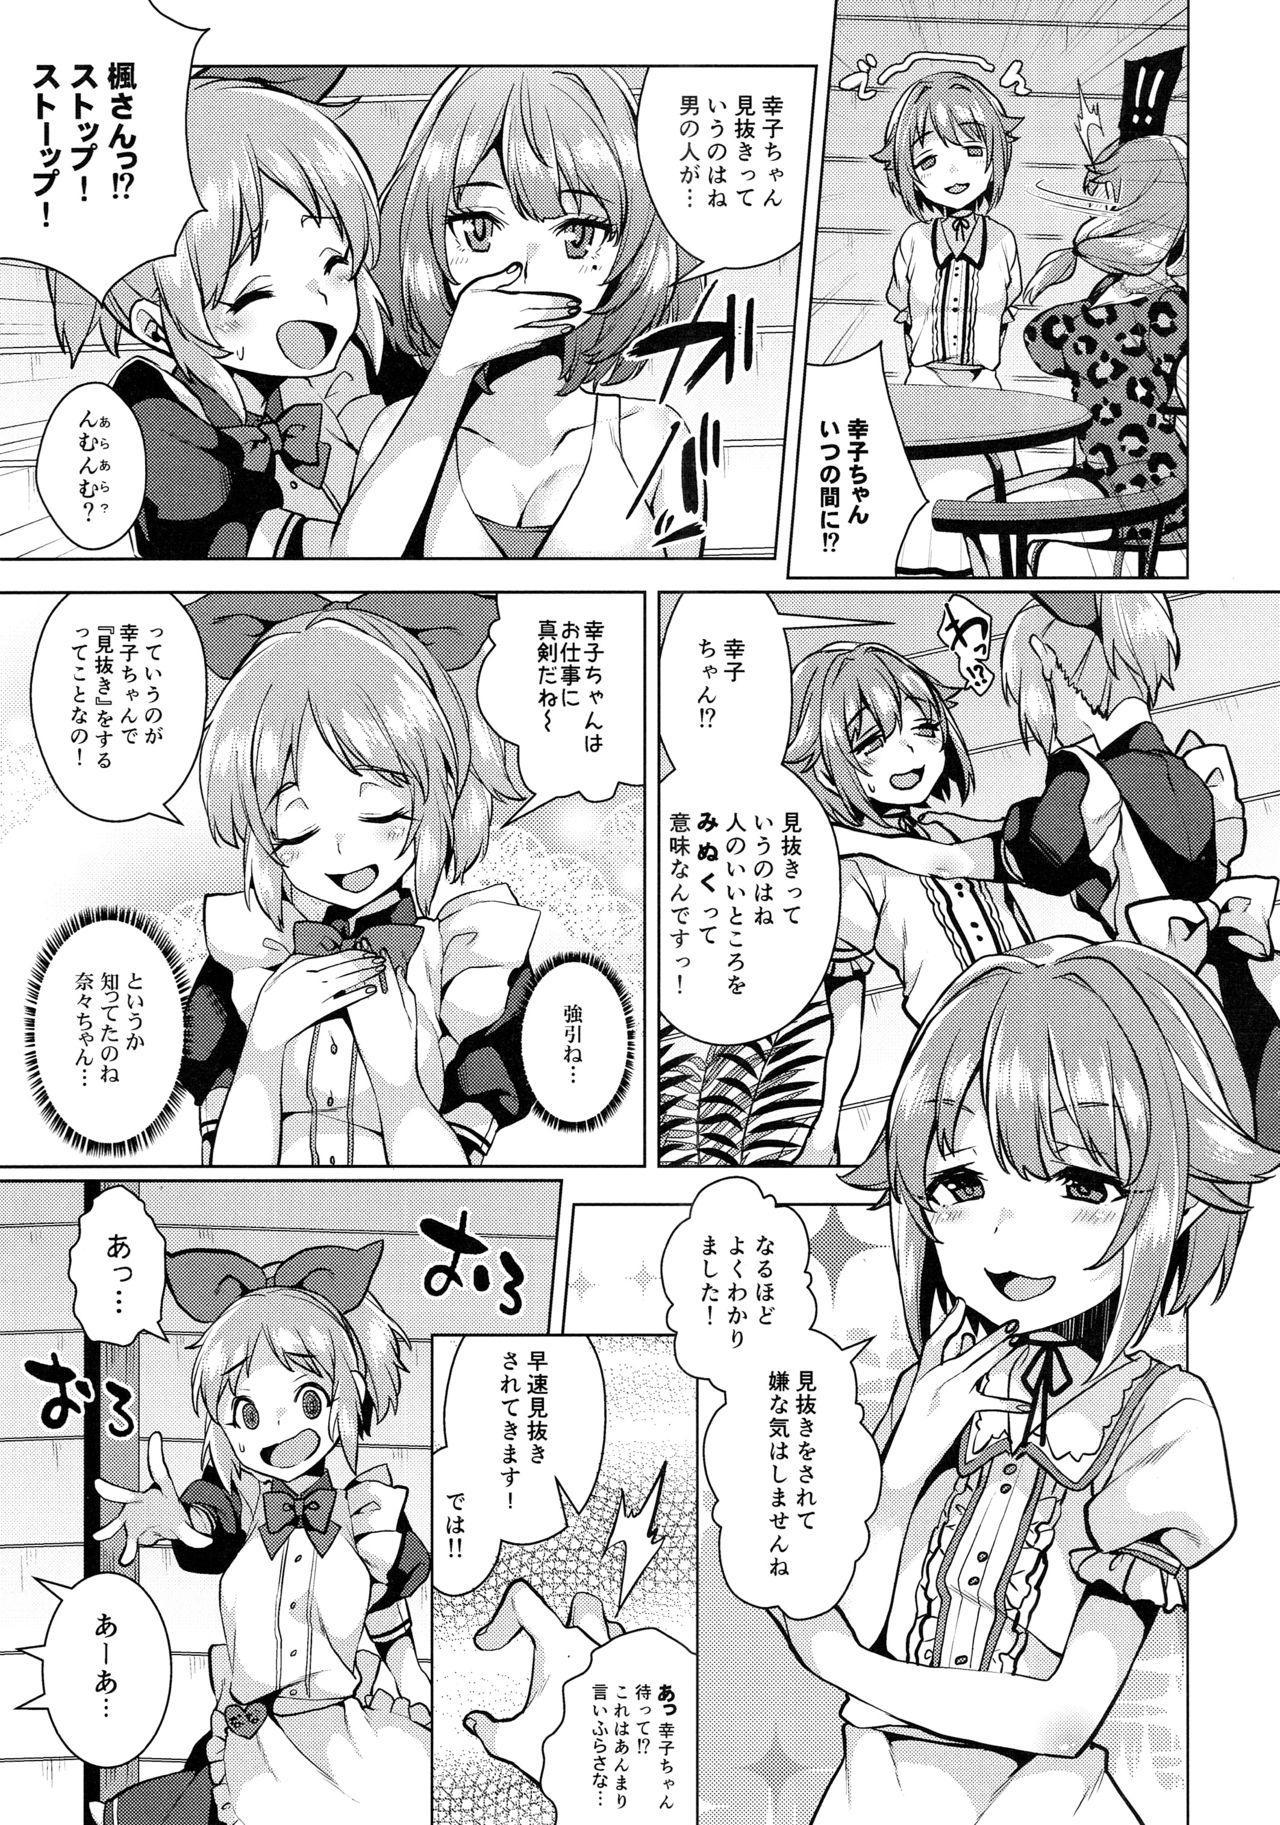 Torokeru Mahou - Melting Magic 23